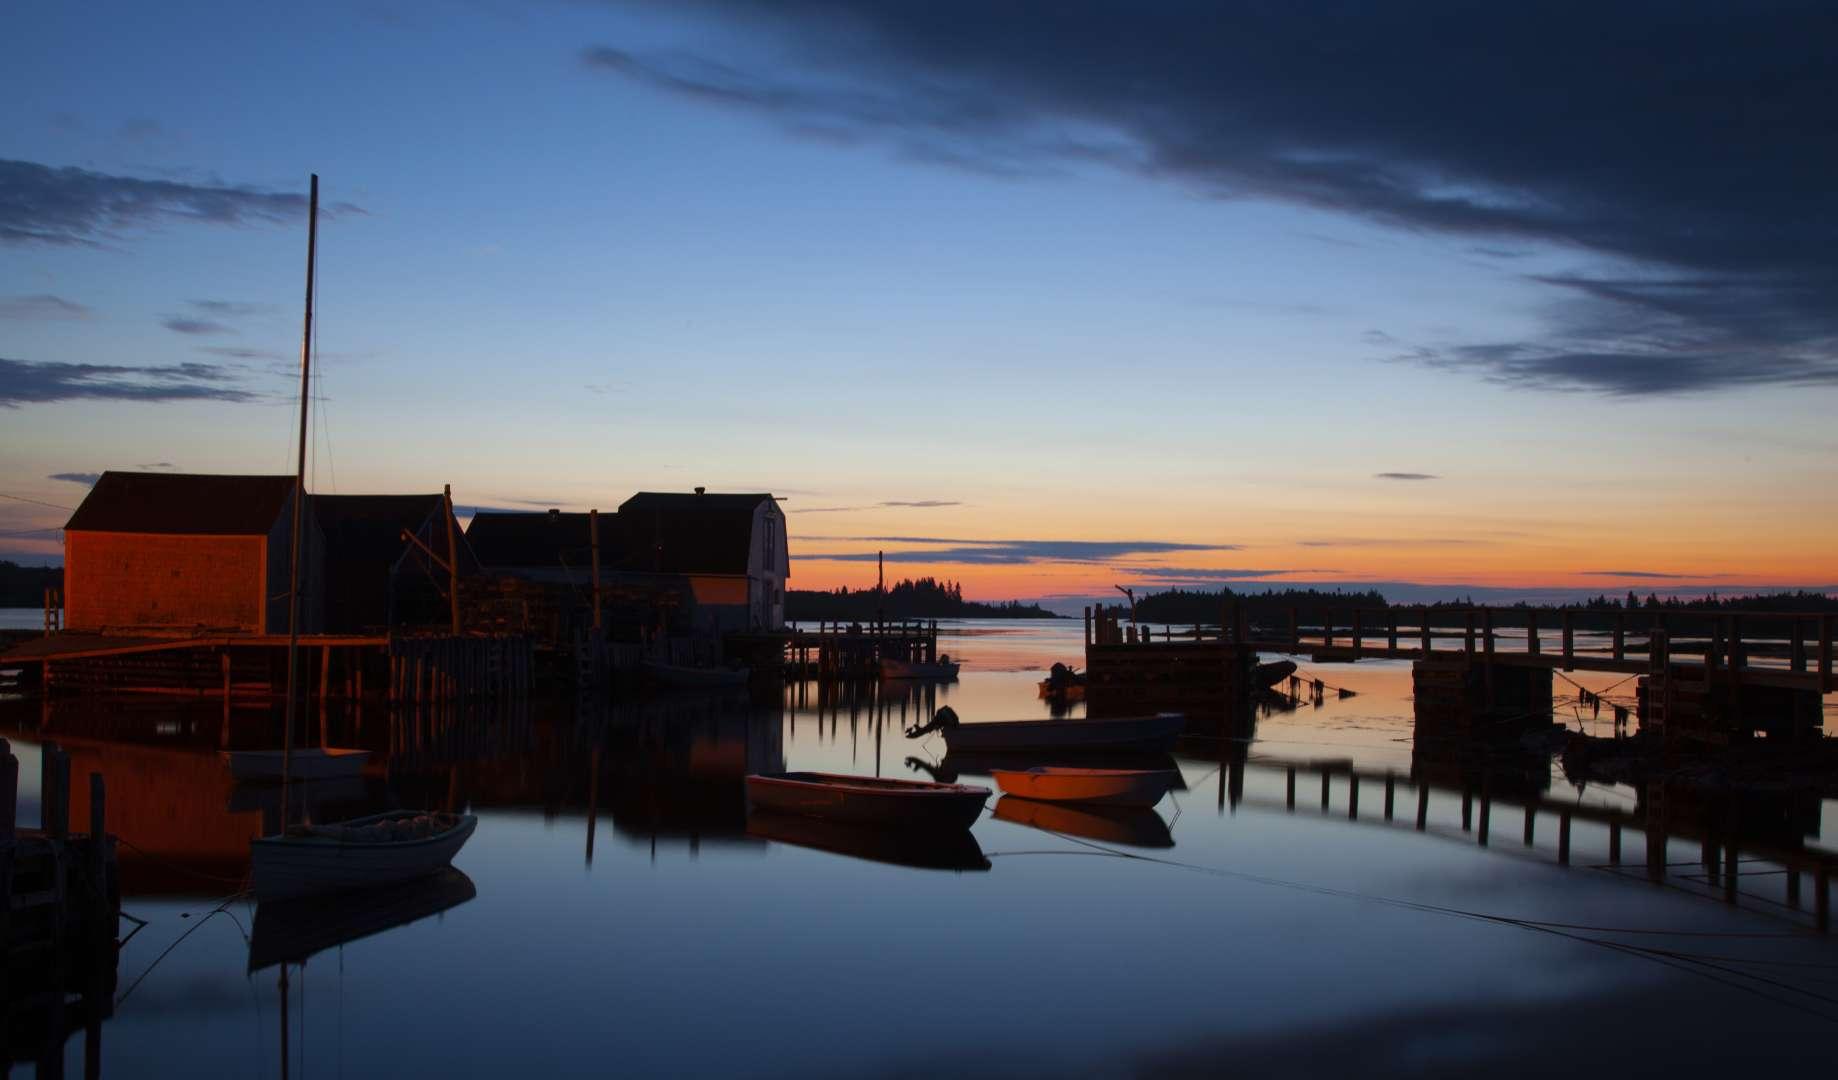 The Sun rises at the fishing village Blue Rocks, in Lunenburg, County, Nova Scotia.